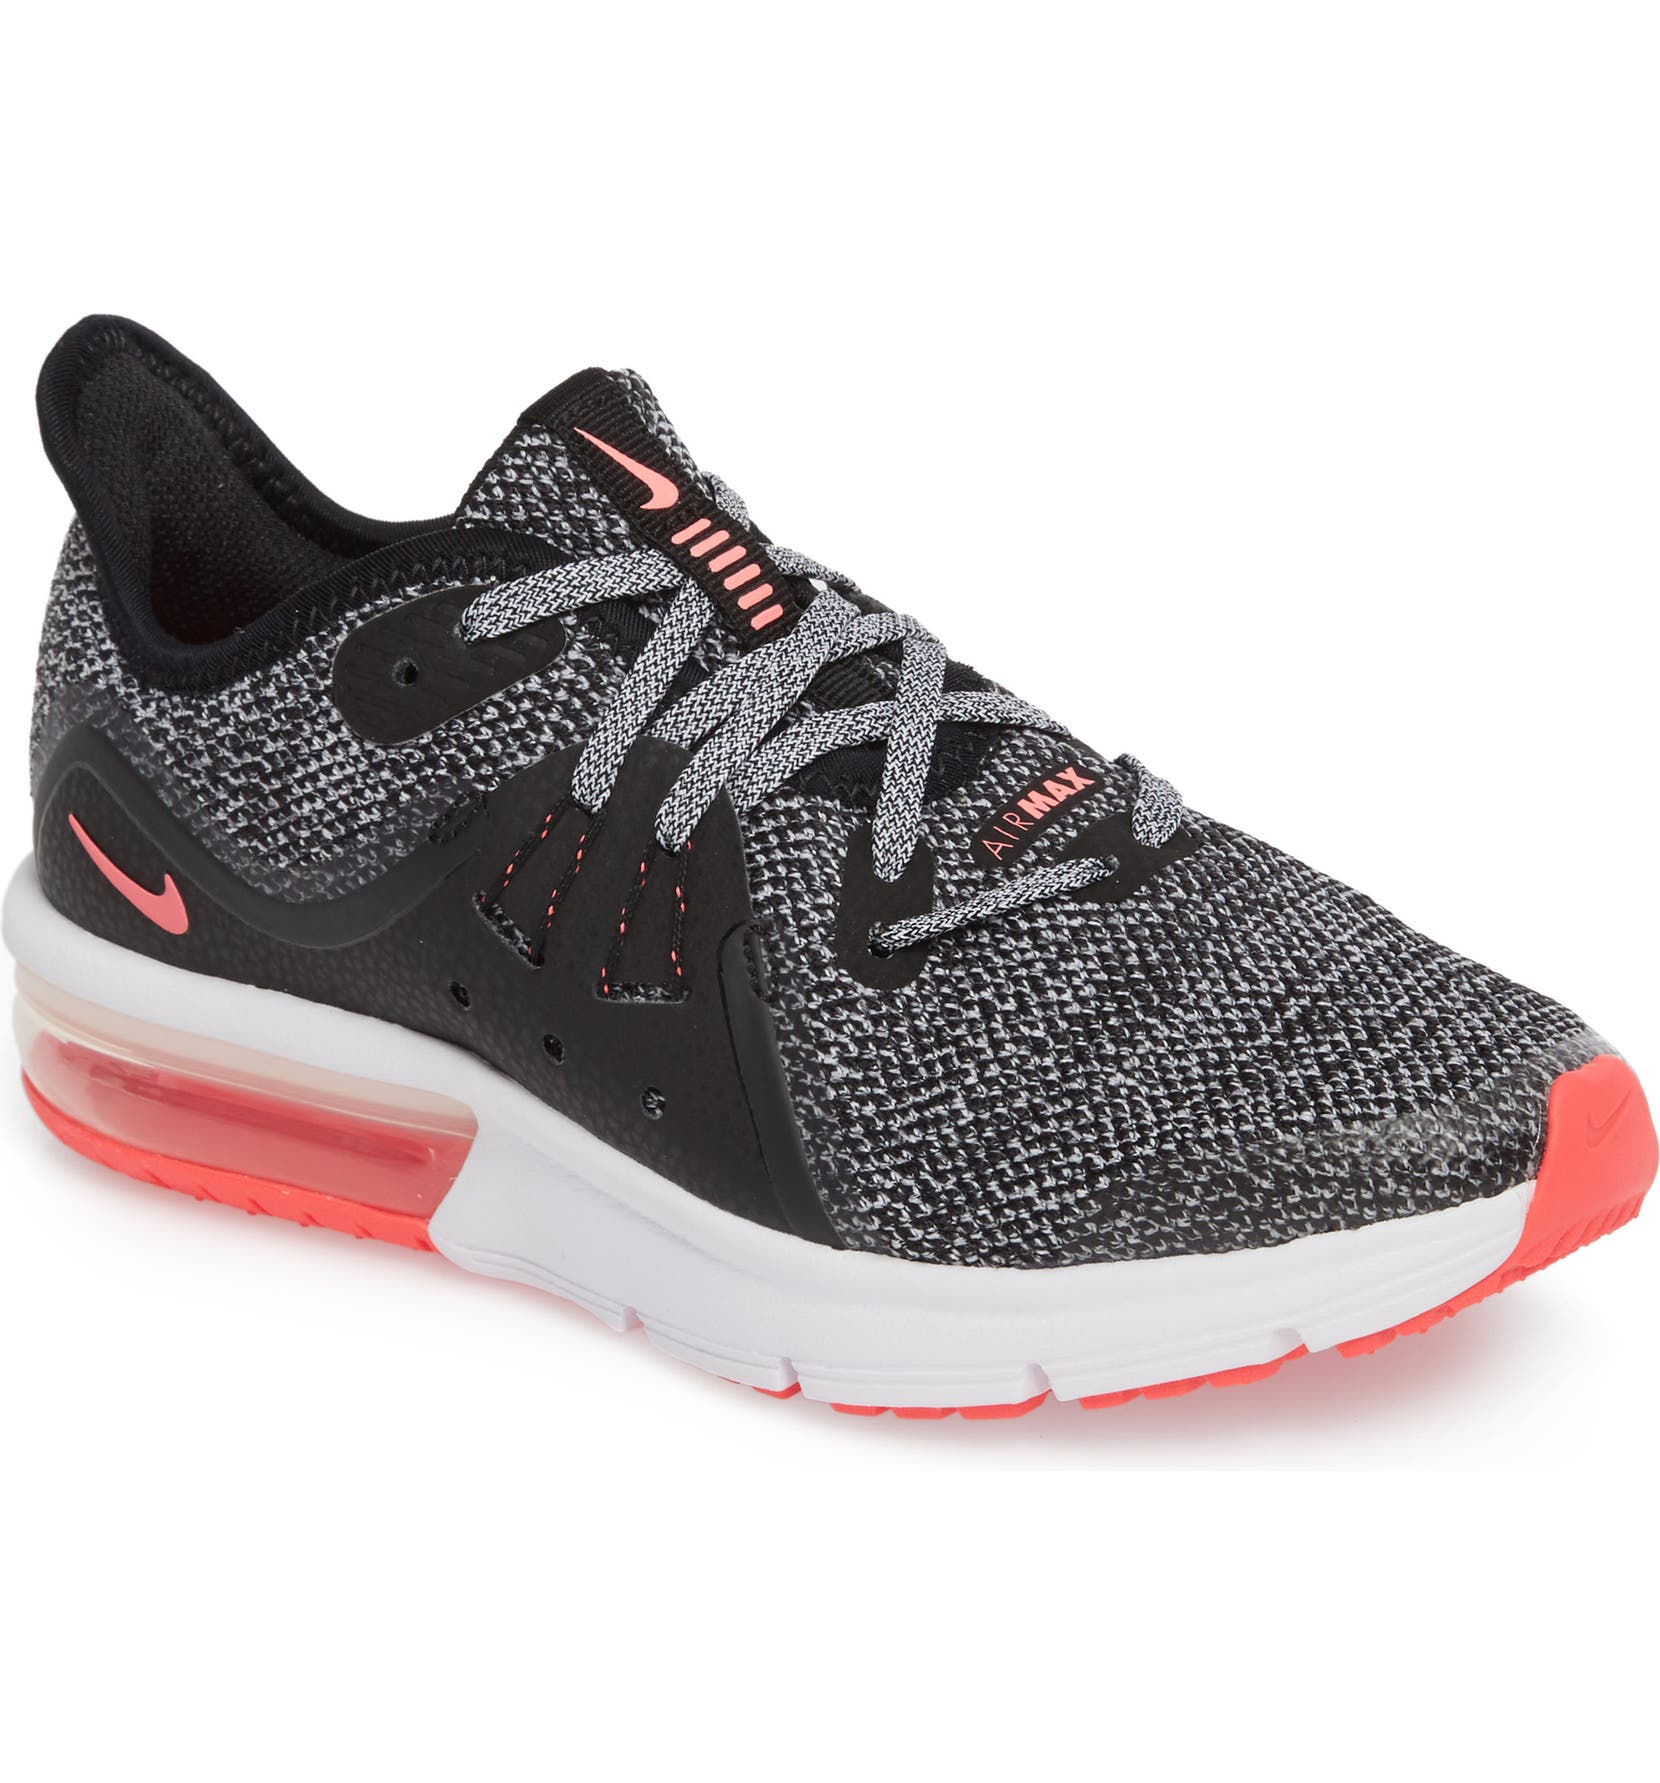 8f46021de7e Nike Air Max Sequent 3 GS Running Shoe (Toddler